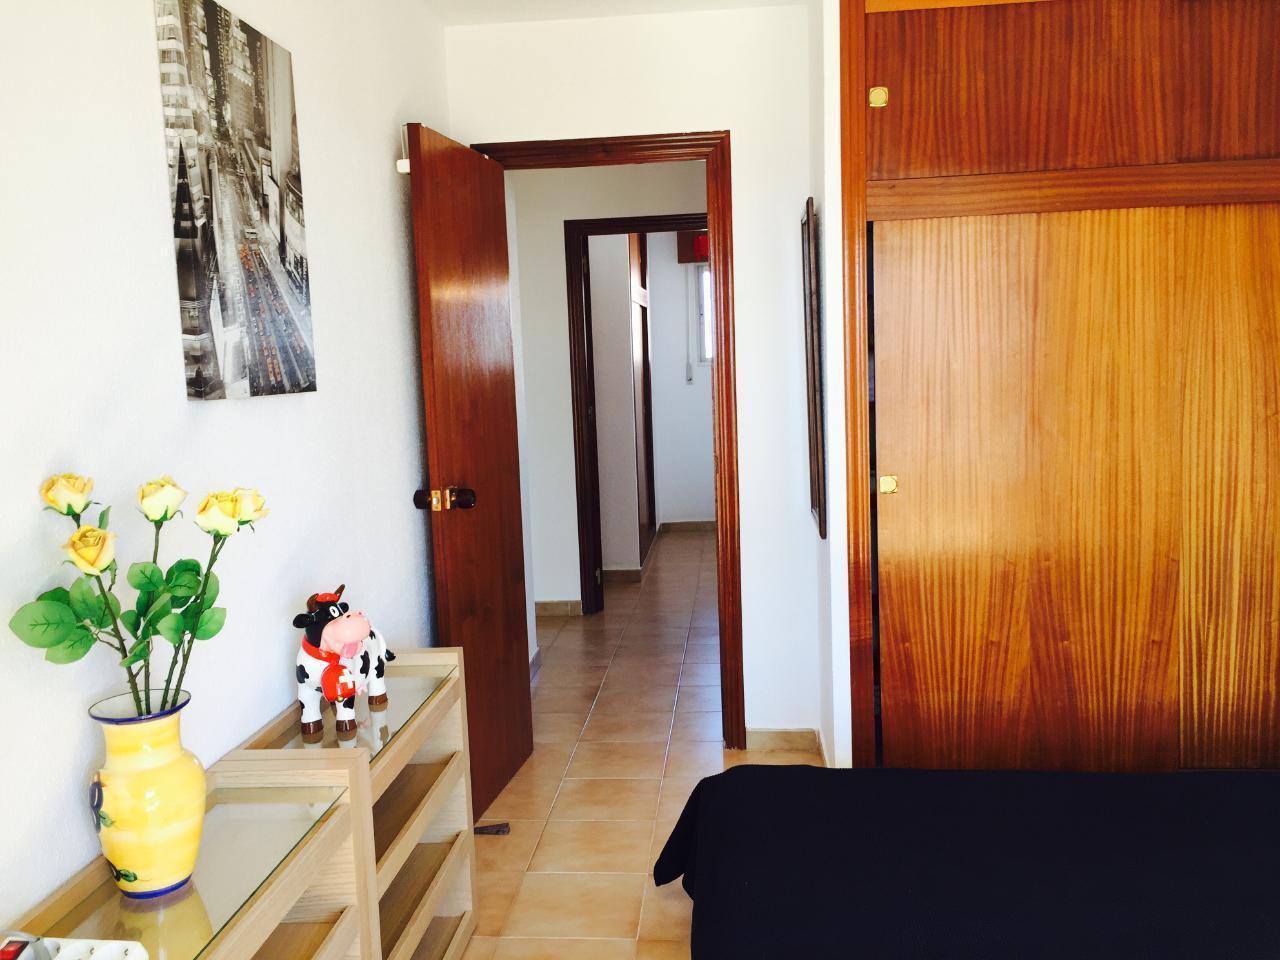 Appartement de vacances Sonnige 3.5 Zi-Wohnung am Meer (1026876), Torrevieja, Costa Blanca, Valence, Espagne, image 13